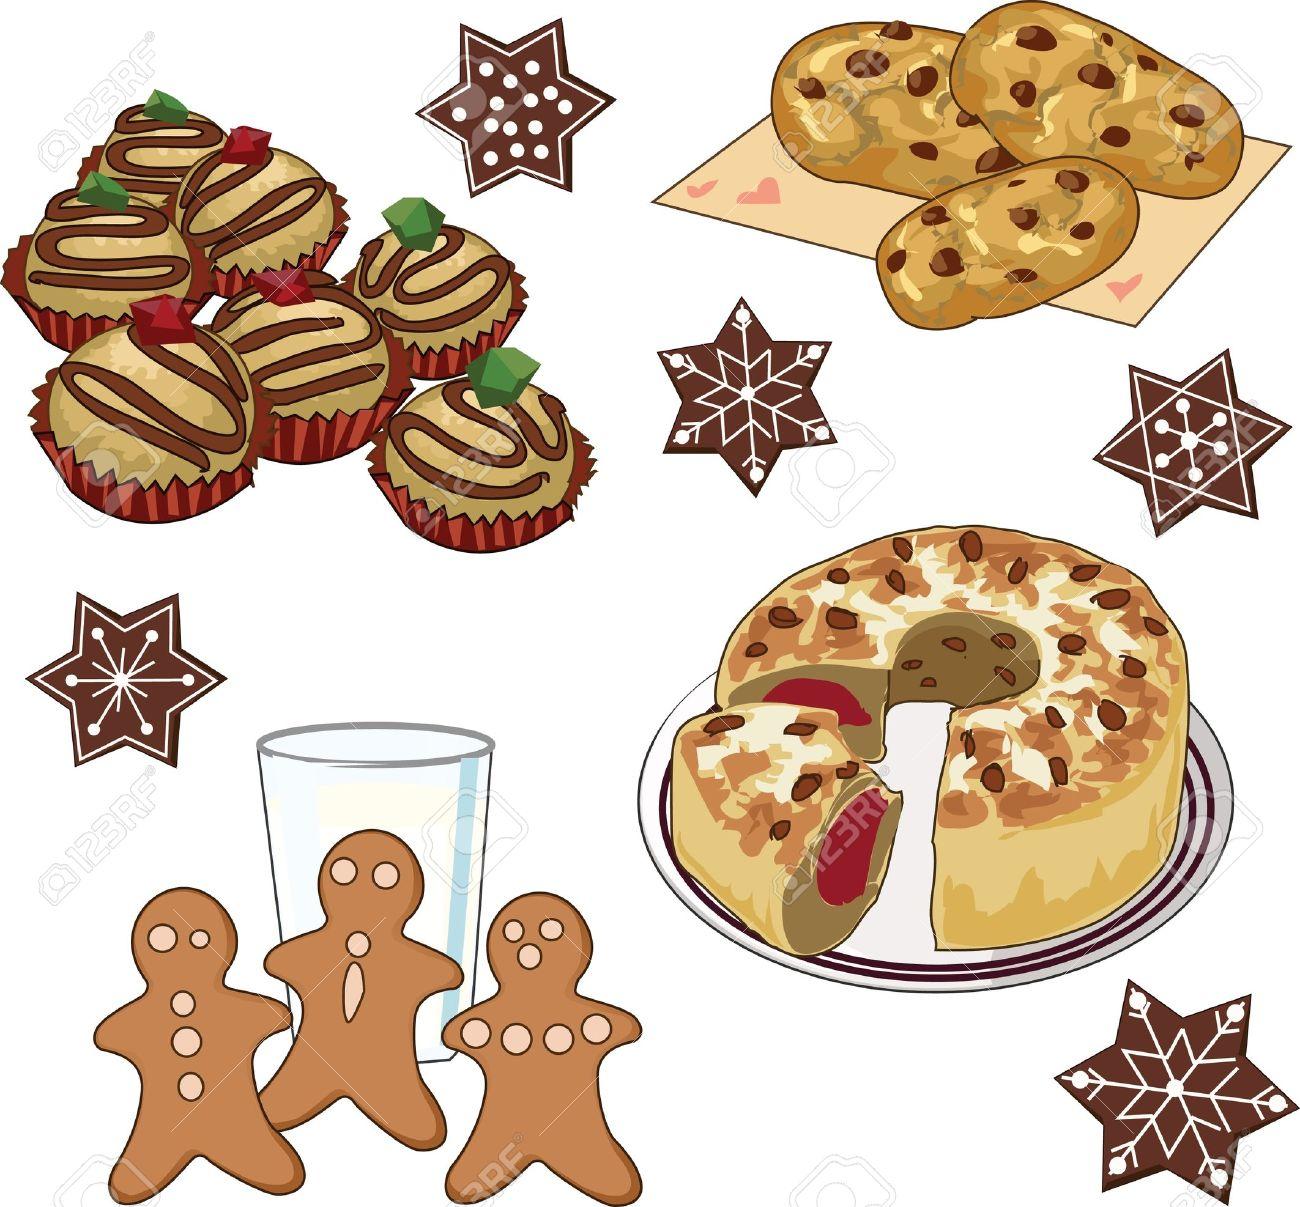 Baked goods clipart clip art. For christmas fun